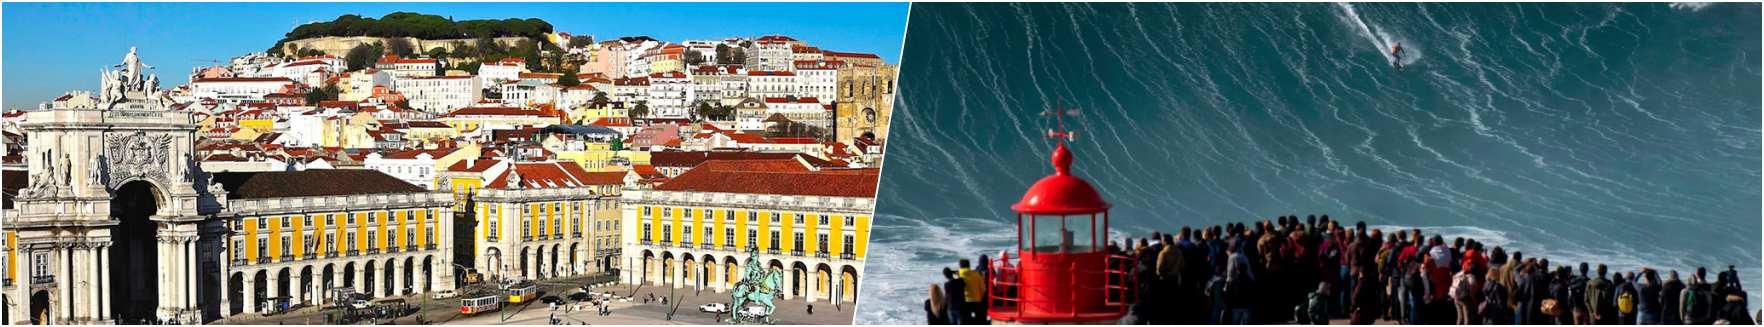 Lisbon - Nazare